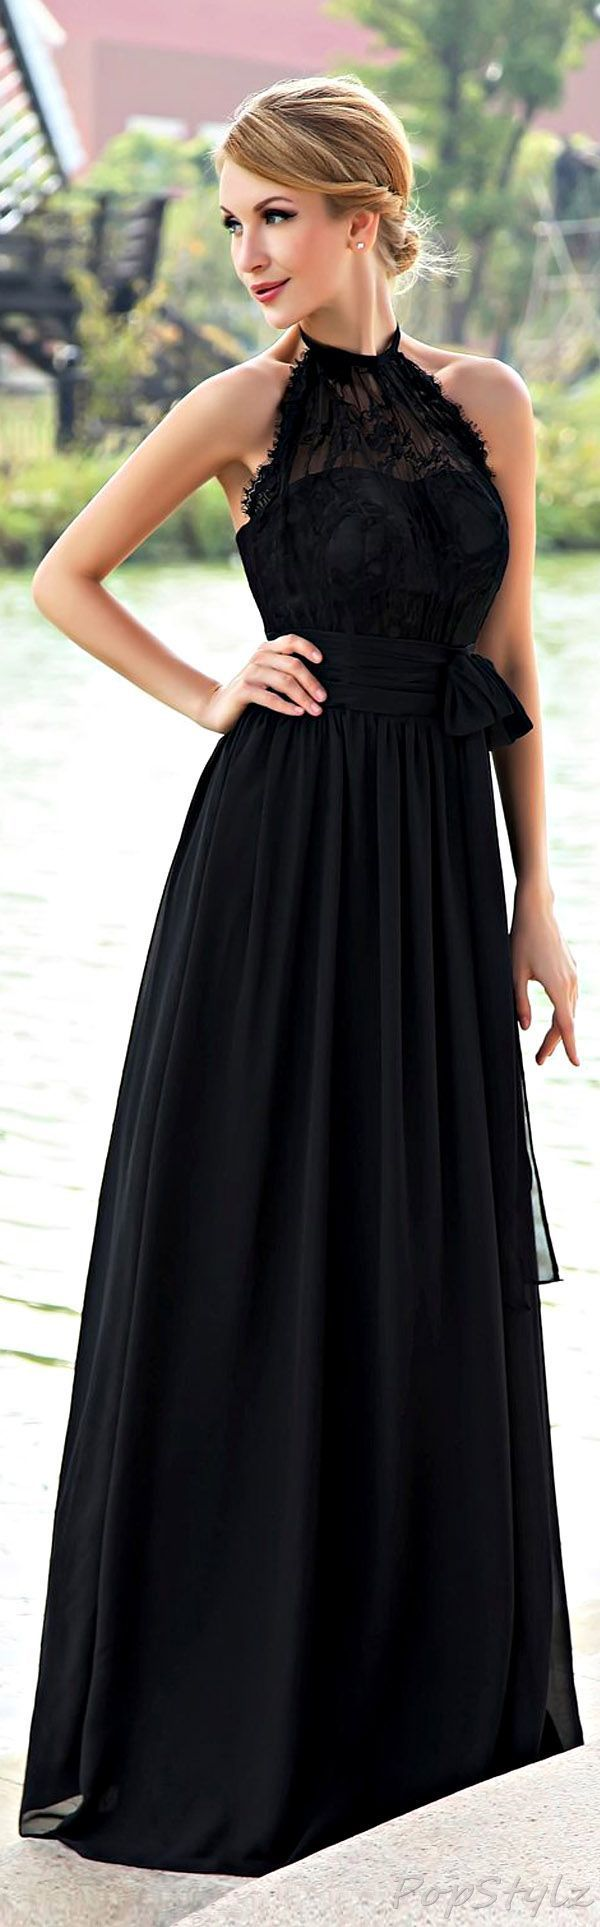 black weddings black wedding dresses Beautiful Black Wedding Dresses Not sure if I wanna quite go the black wedding dress